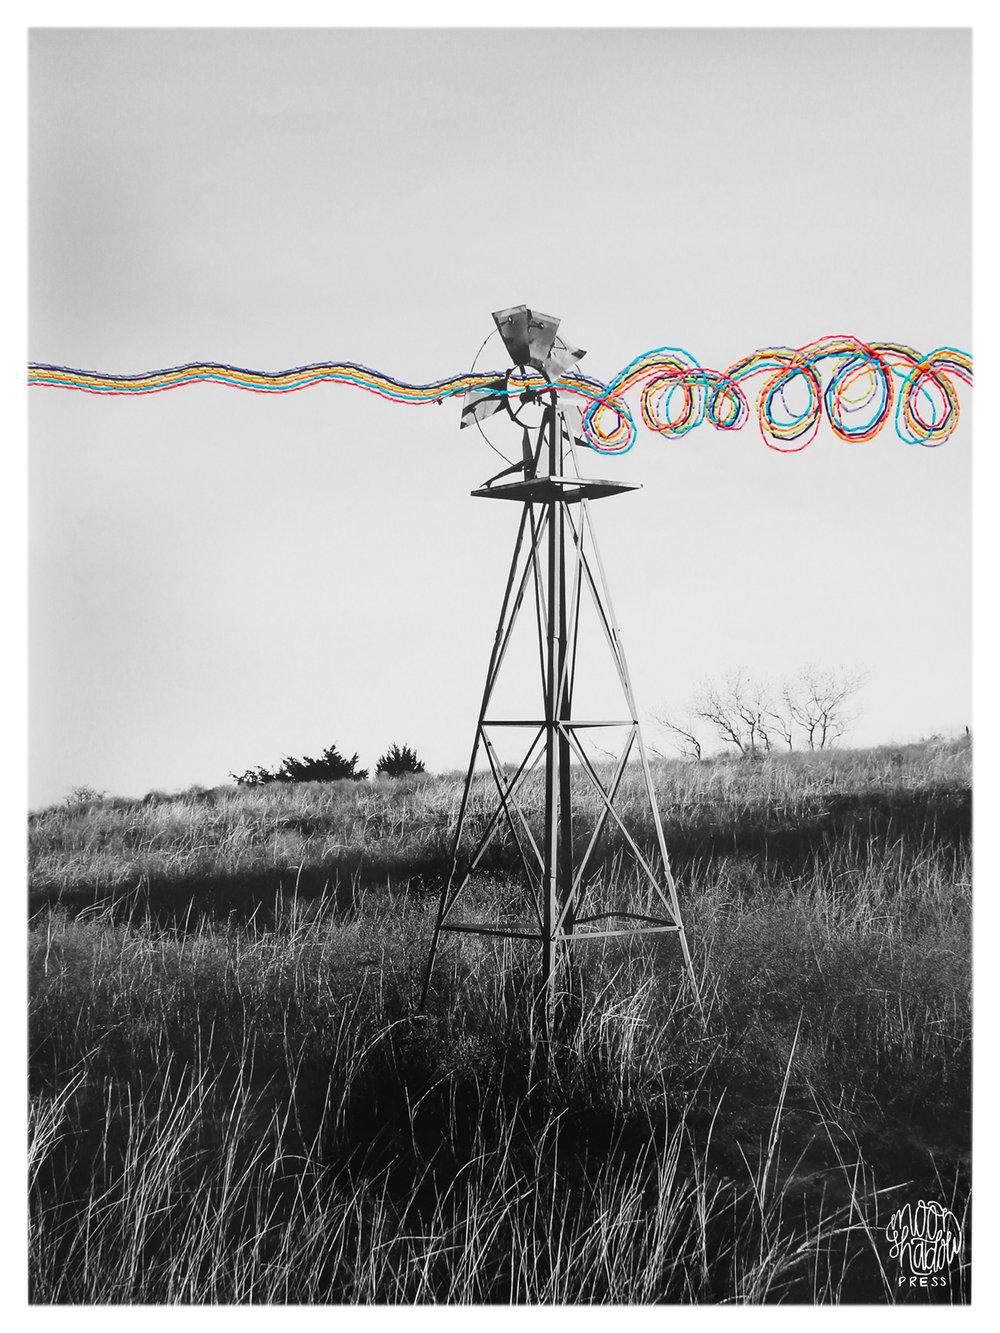 Windmill_Stitch_3_logo.jpg